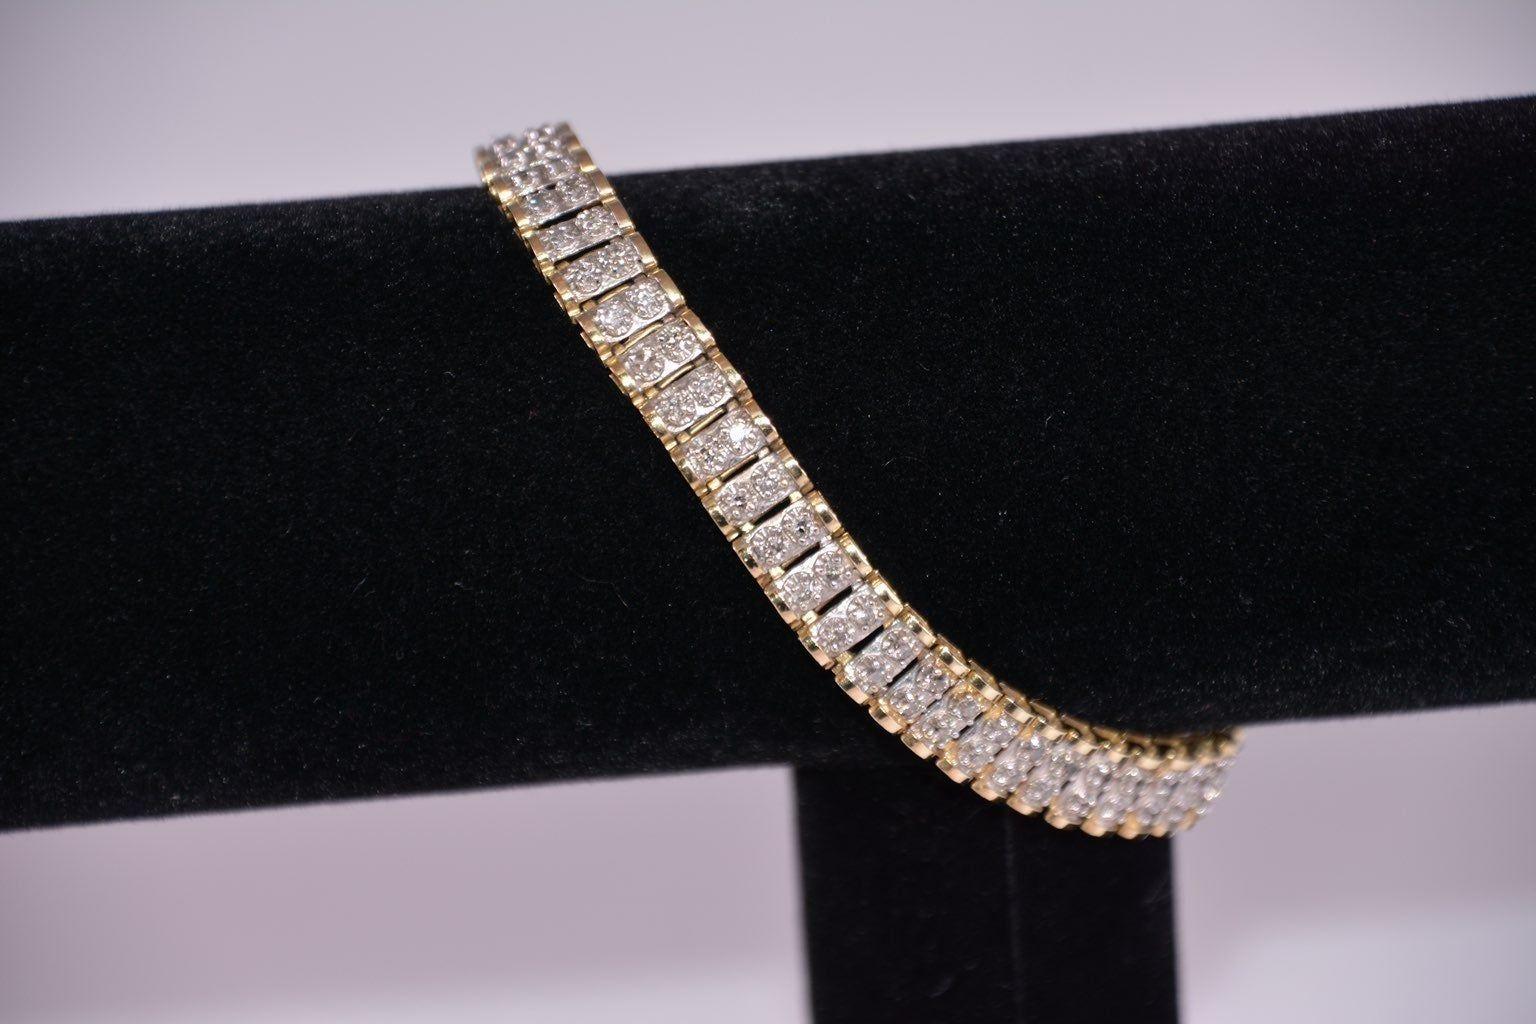 Diamond And Gold Tennis Bracelet on Mercari Amethyst